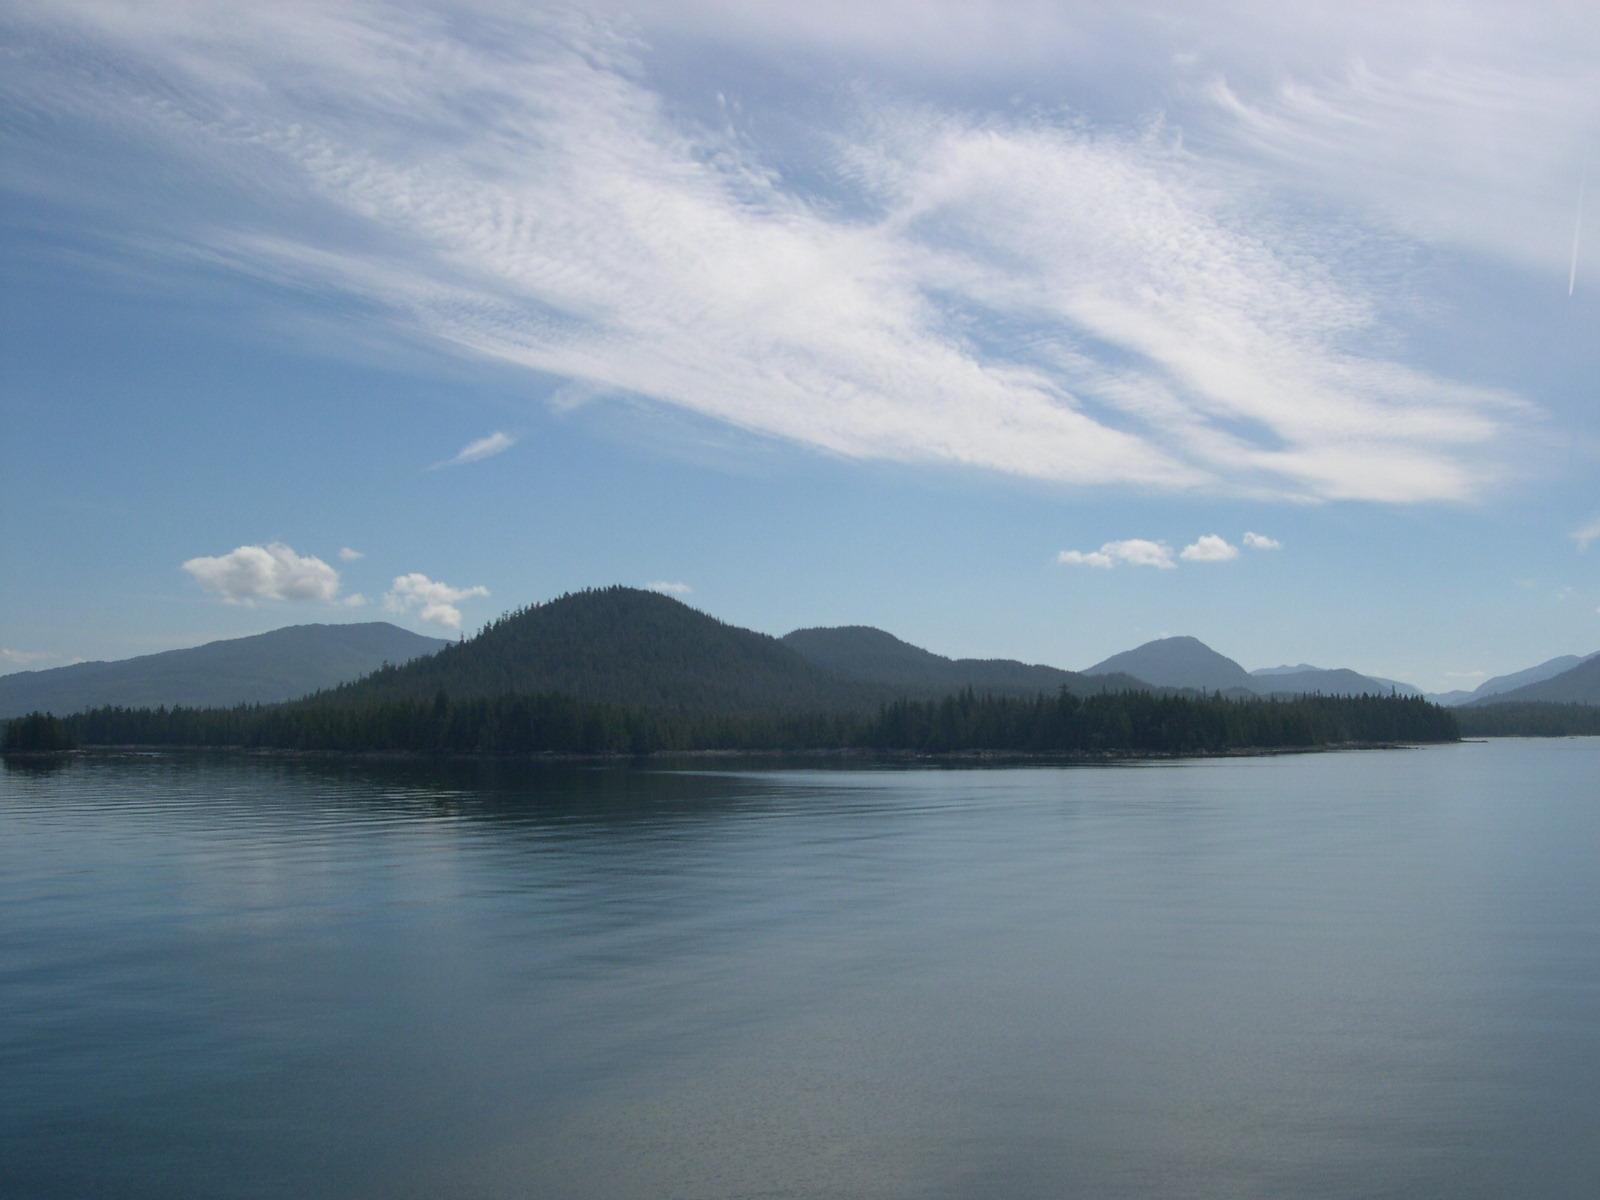 Getting To Haida Gwaii Queen Charlotte Islands